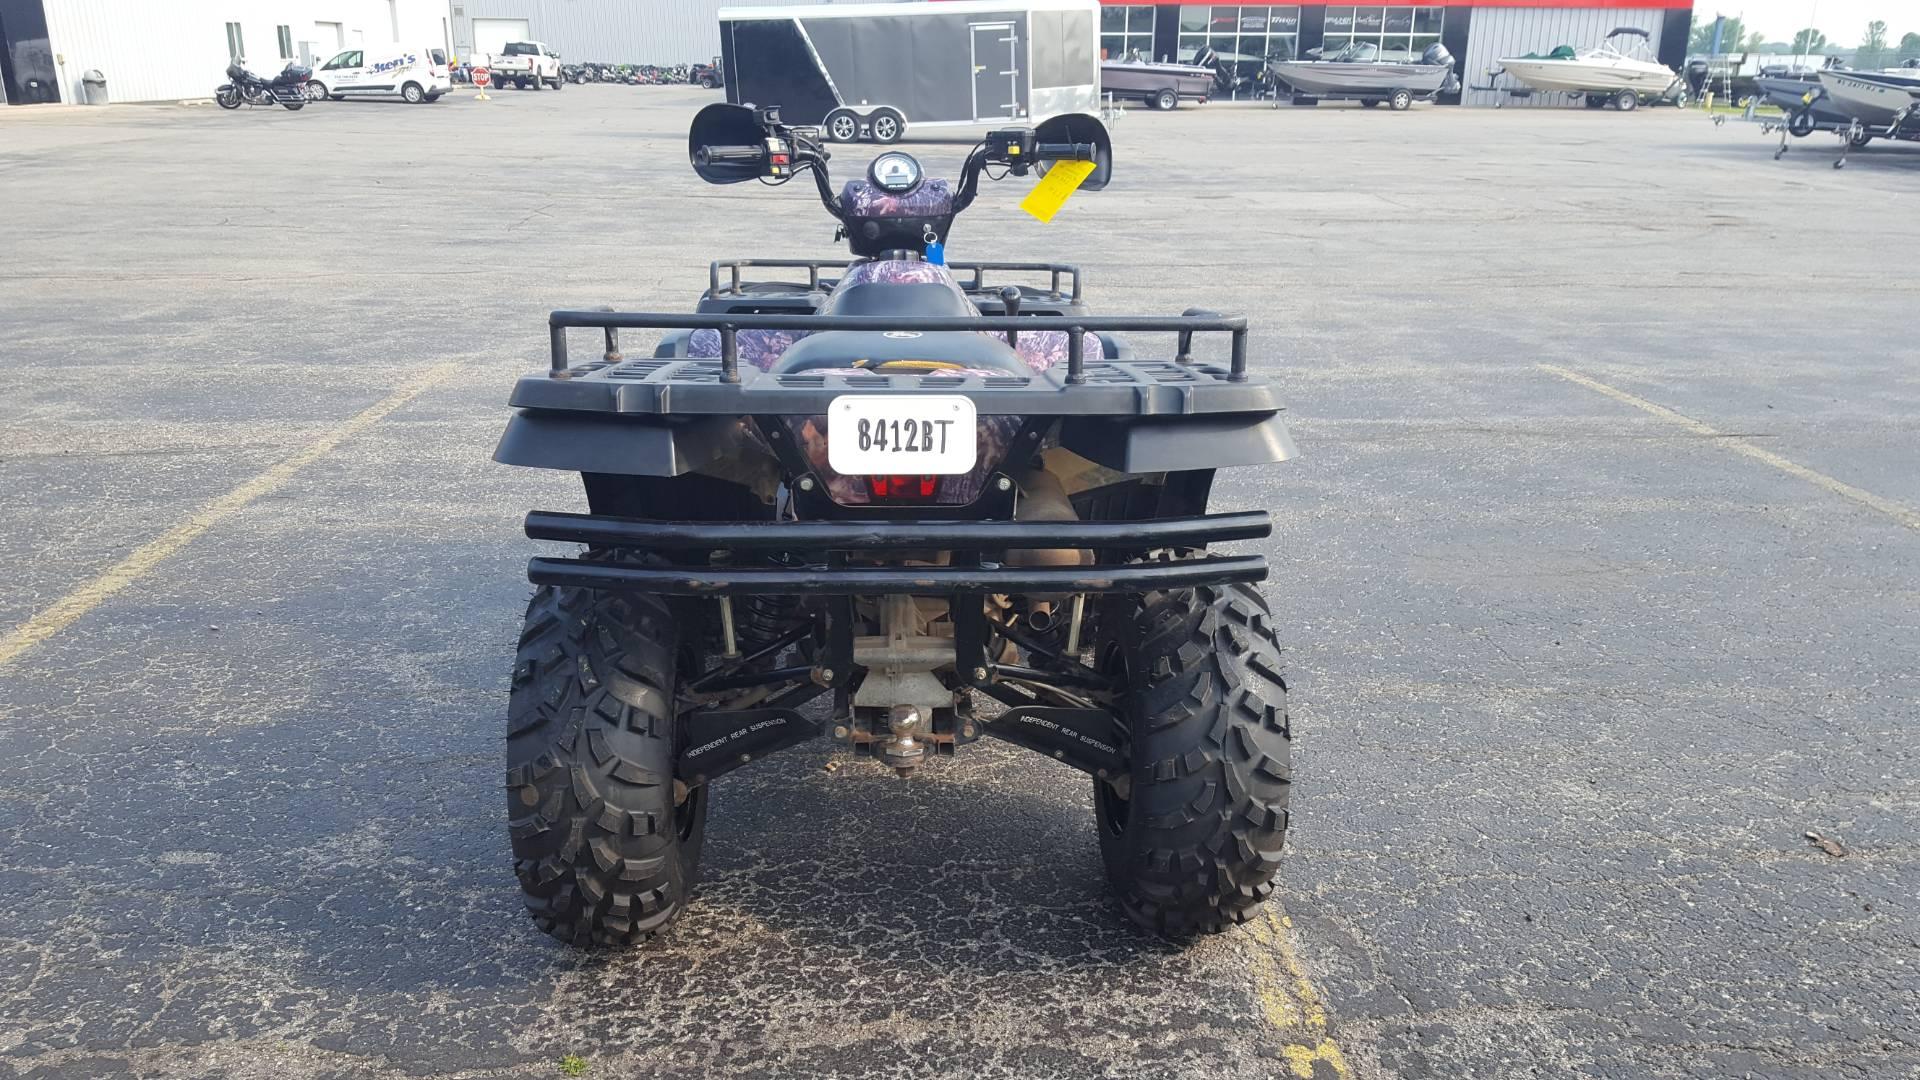 Used 2004 Polaris Sportsman 700 Twin Atvs In Kaukauna Wi 322546 Fuel Filter Wisconsin